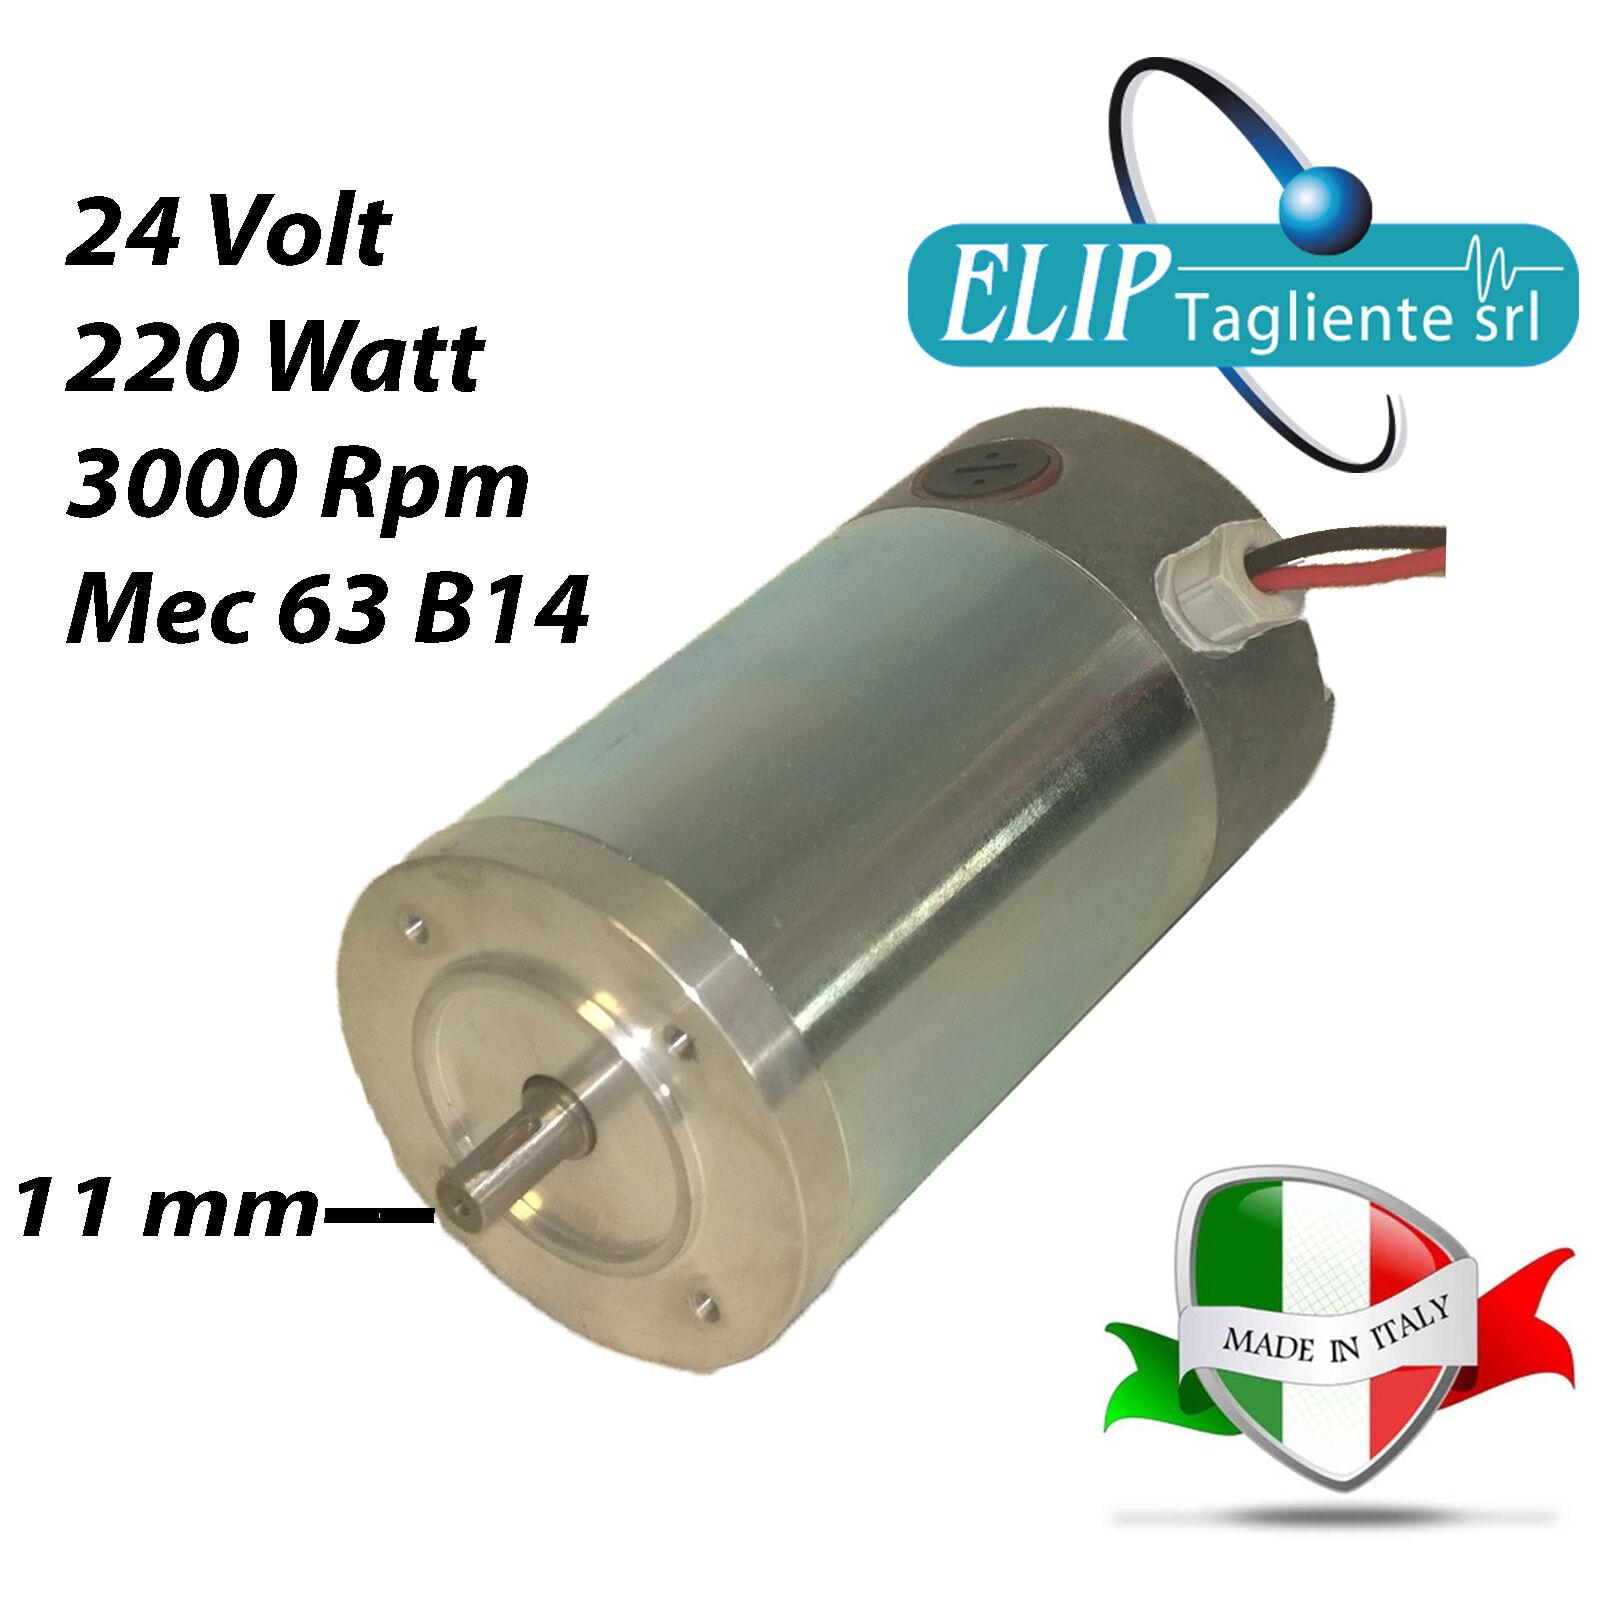 MOTORE ELETTRICO 12V-24V-36V-48V-72V-110VDC 220 WATT 3000 RPM MAGNETI PERMANENTI